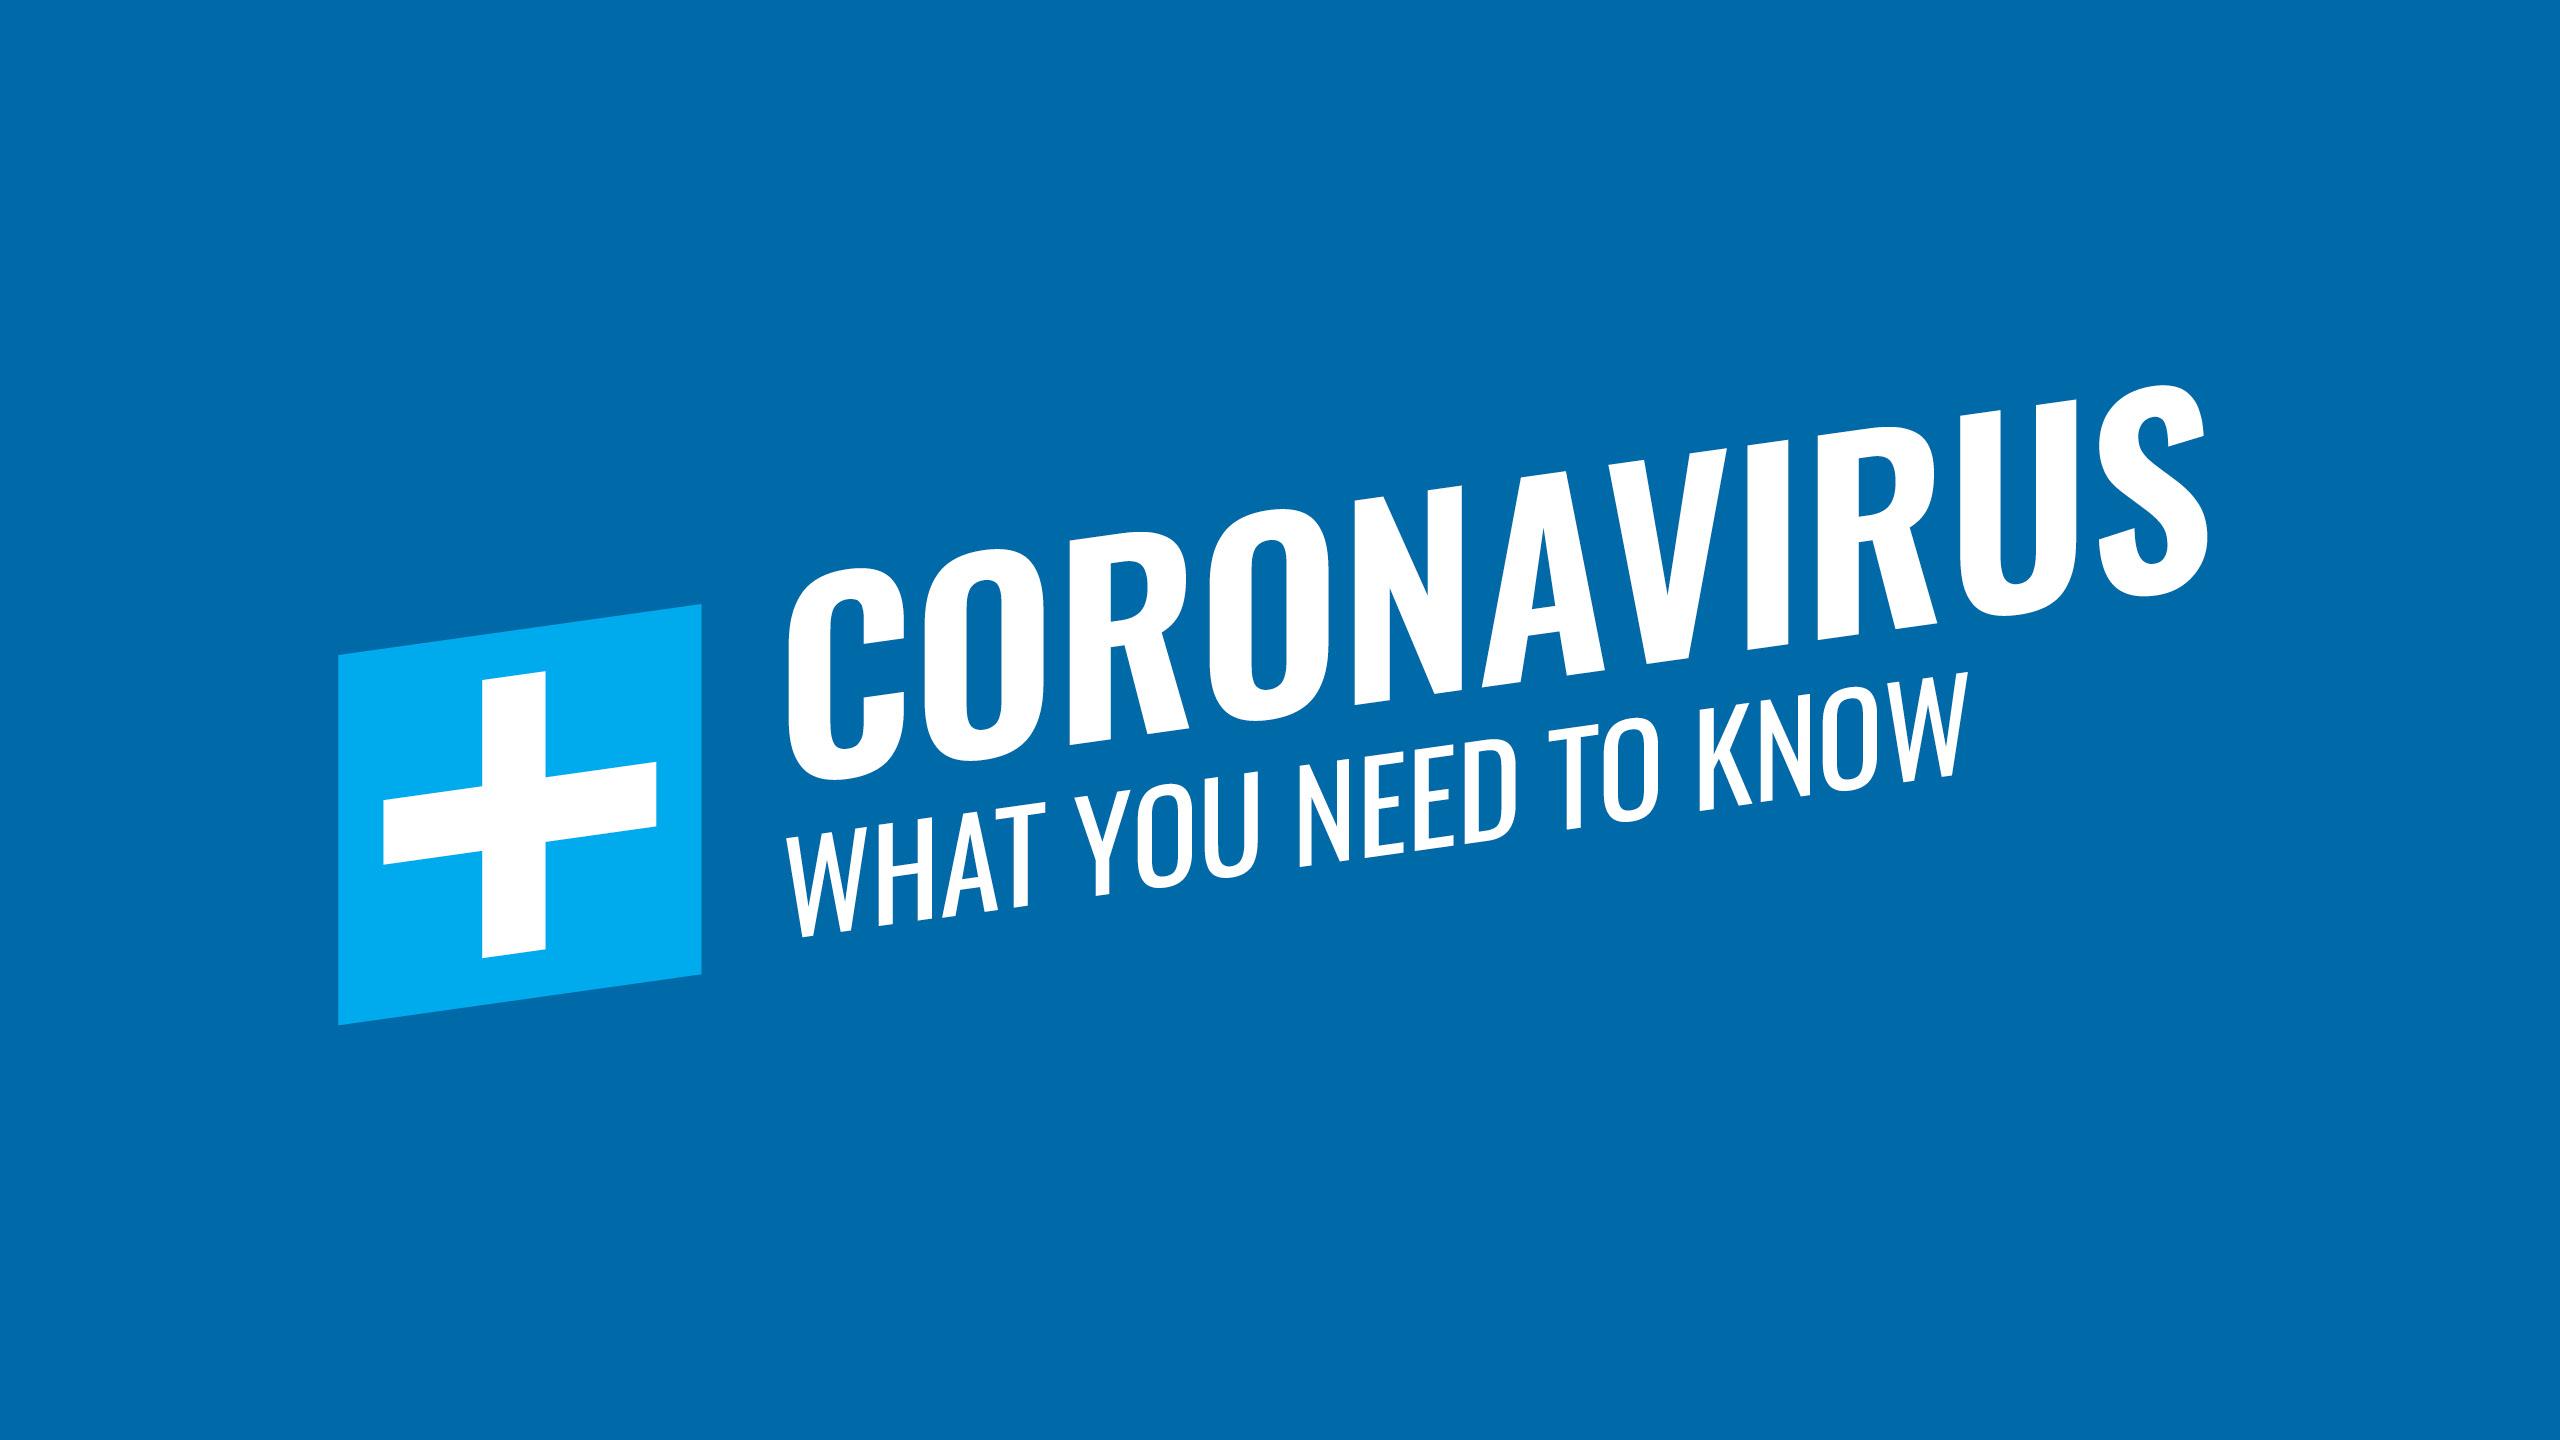 UHCL posts statement about 2019 Novel Coronavirus